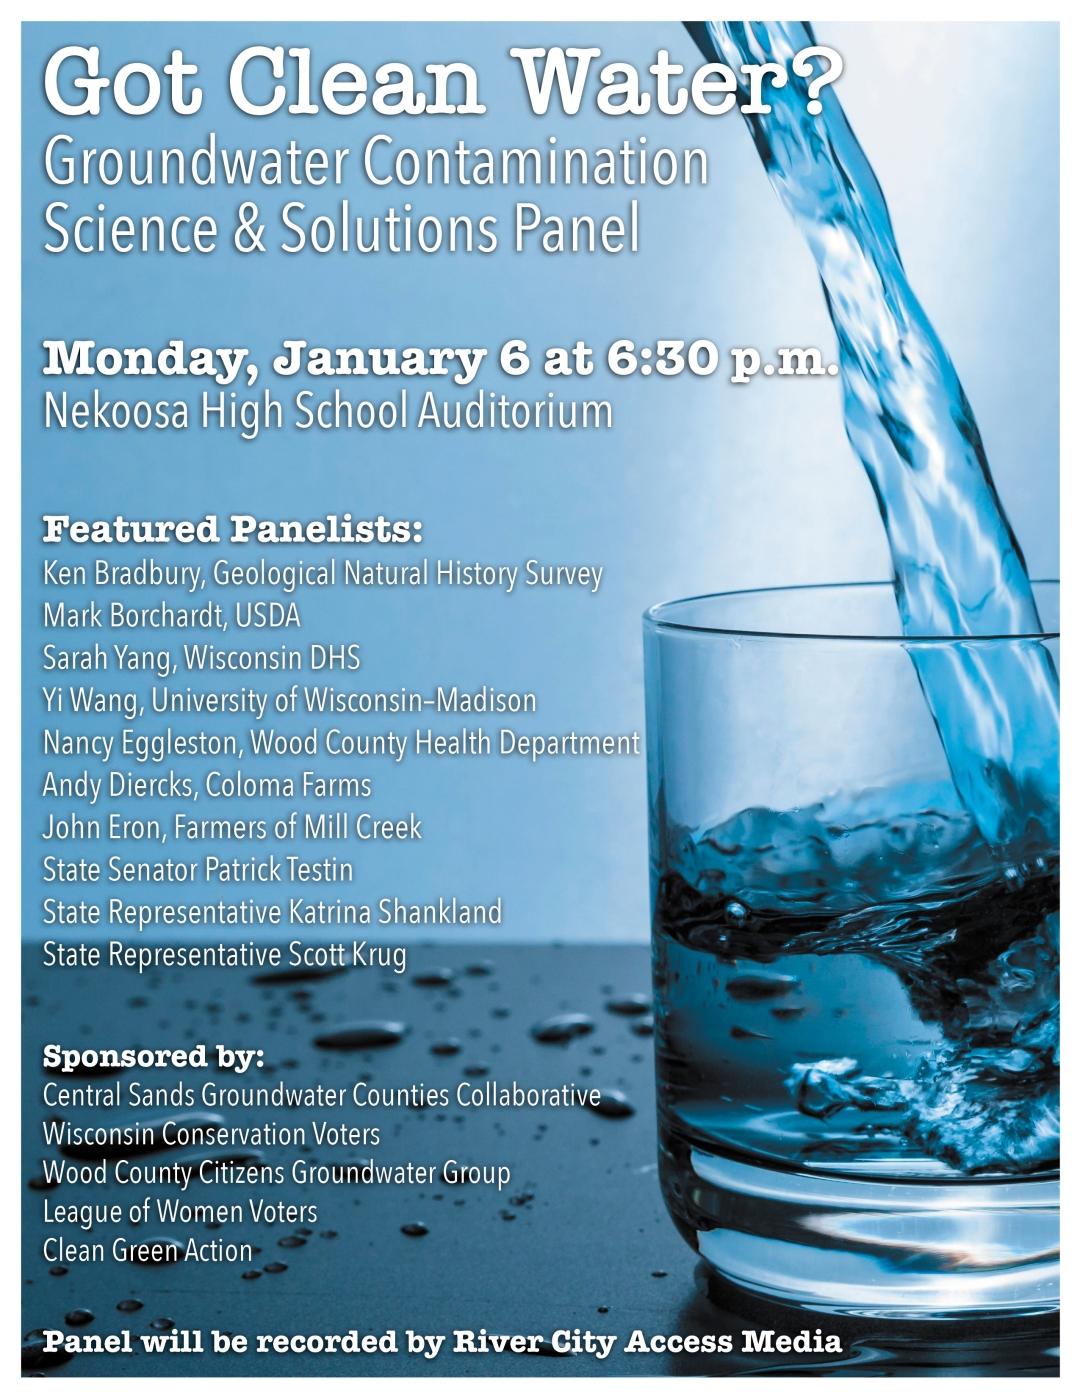 Water Panel Poster V4